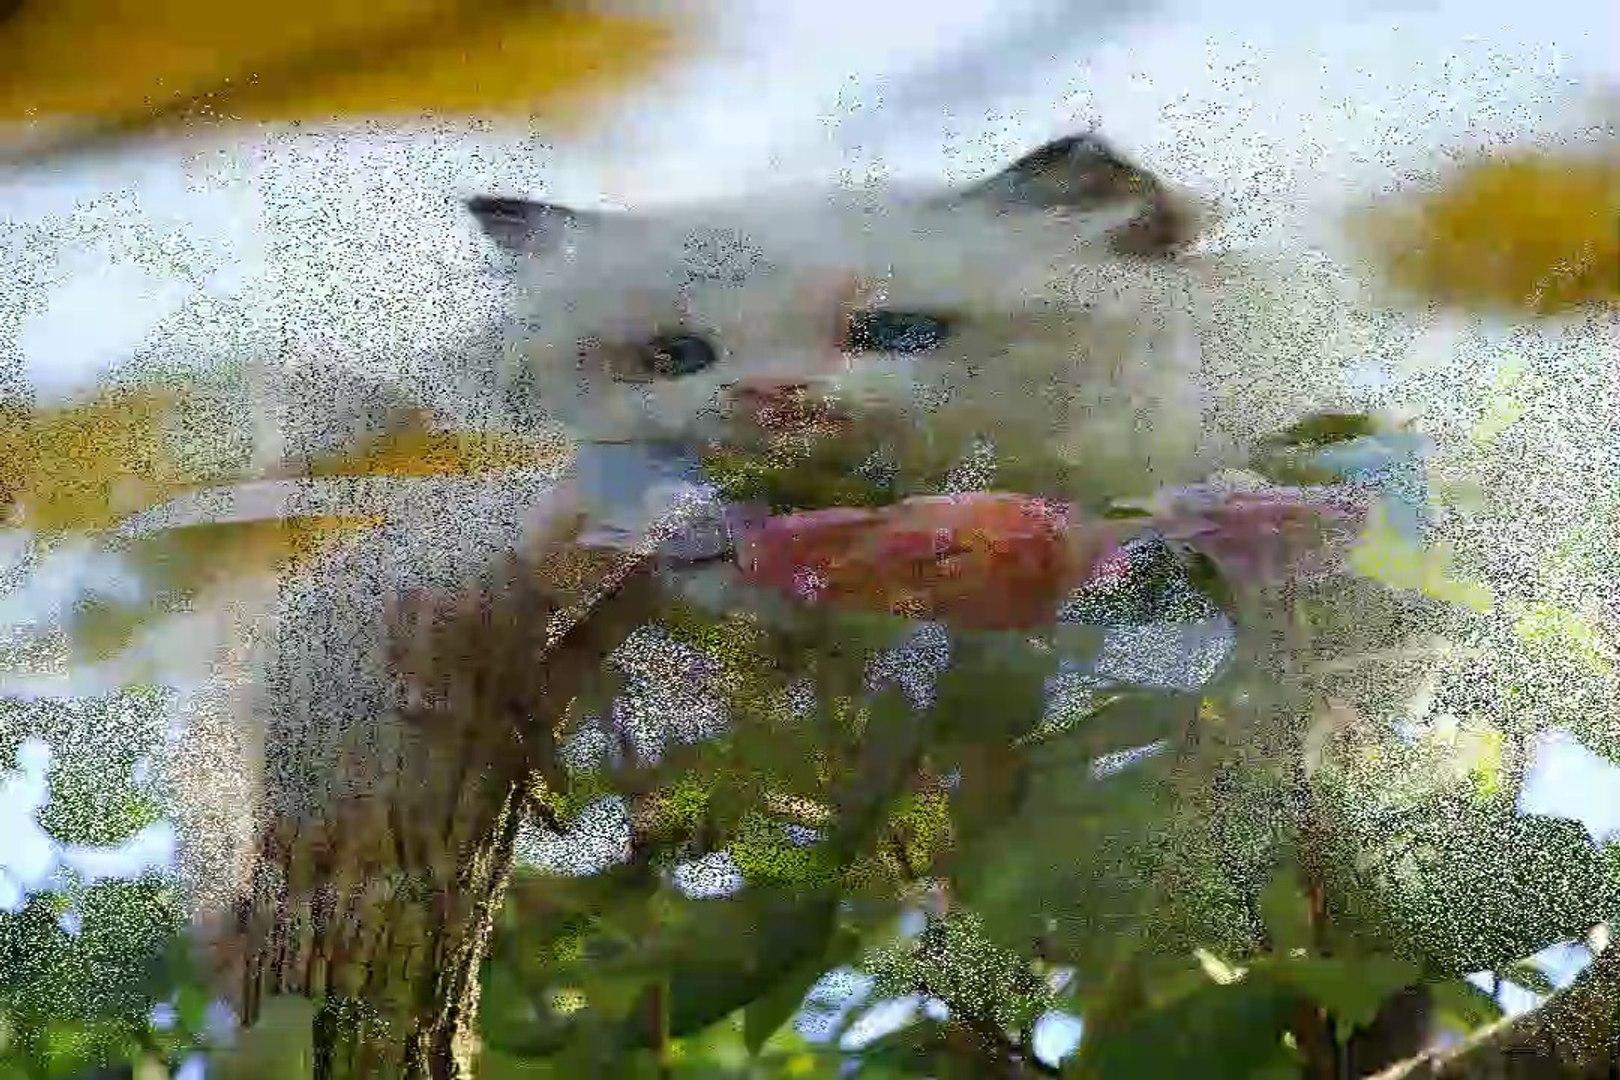 cute cats| cats are cute| cute cat videos| cute cat funny videos| cat| cats| kittens| part 2